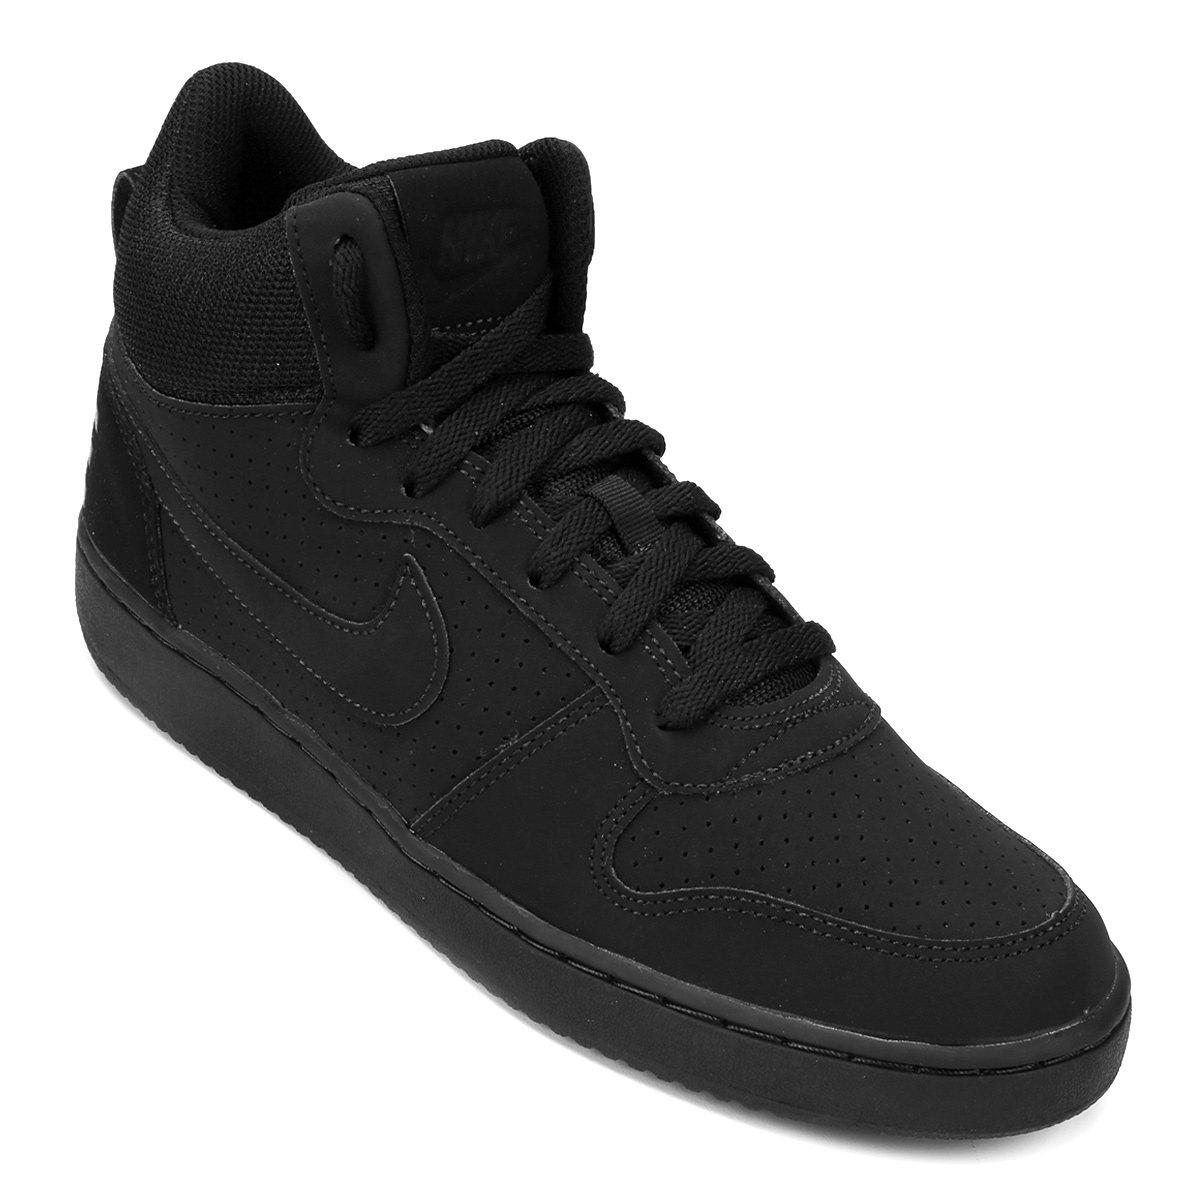 vestir Fragante Inquieto  Tênis Couro Cano Alto Nike Recreation Mid Masculino | Loja do Inter